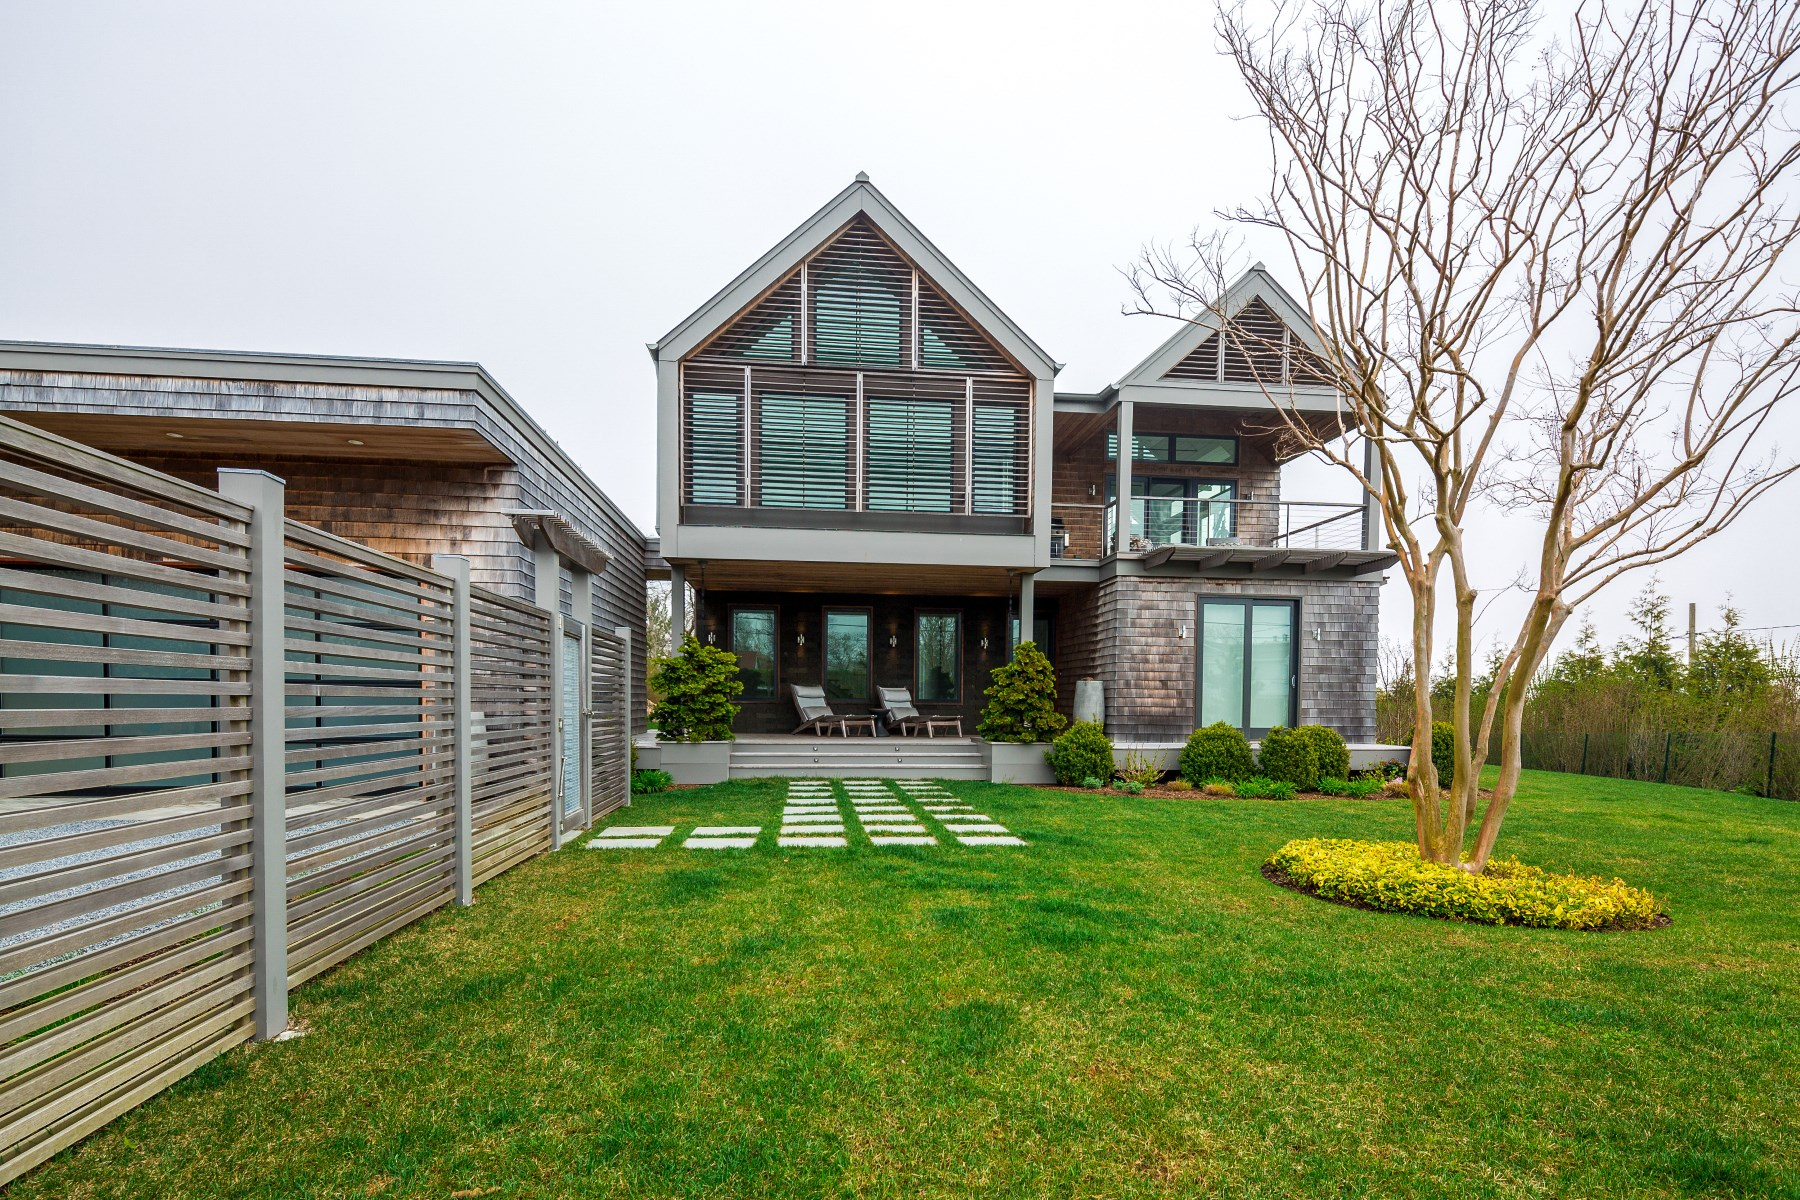 Single Family Home for Rent at Modern Montauk Masterpiece Ocean Views 79 Monroe Drive Montauk, New York 11954 United States